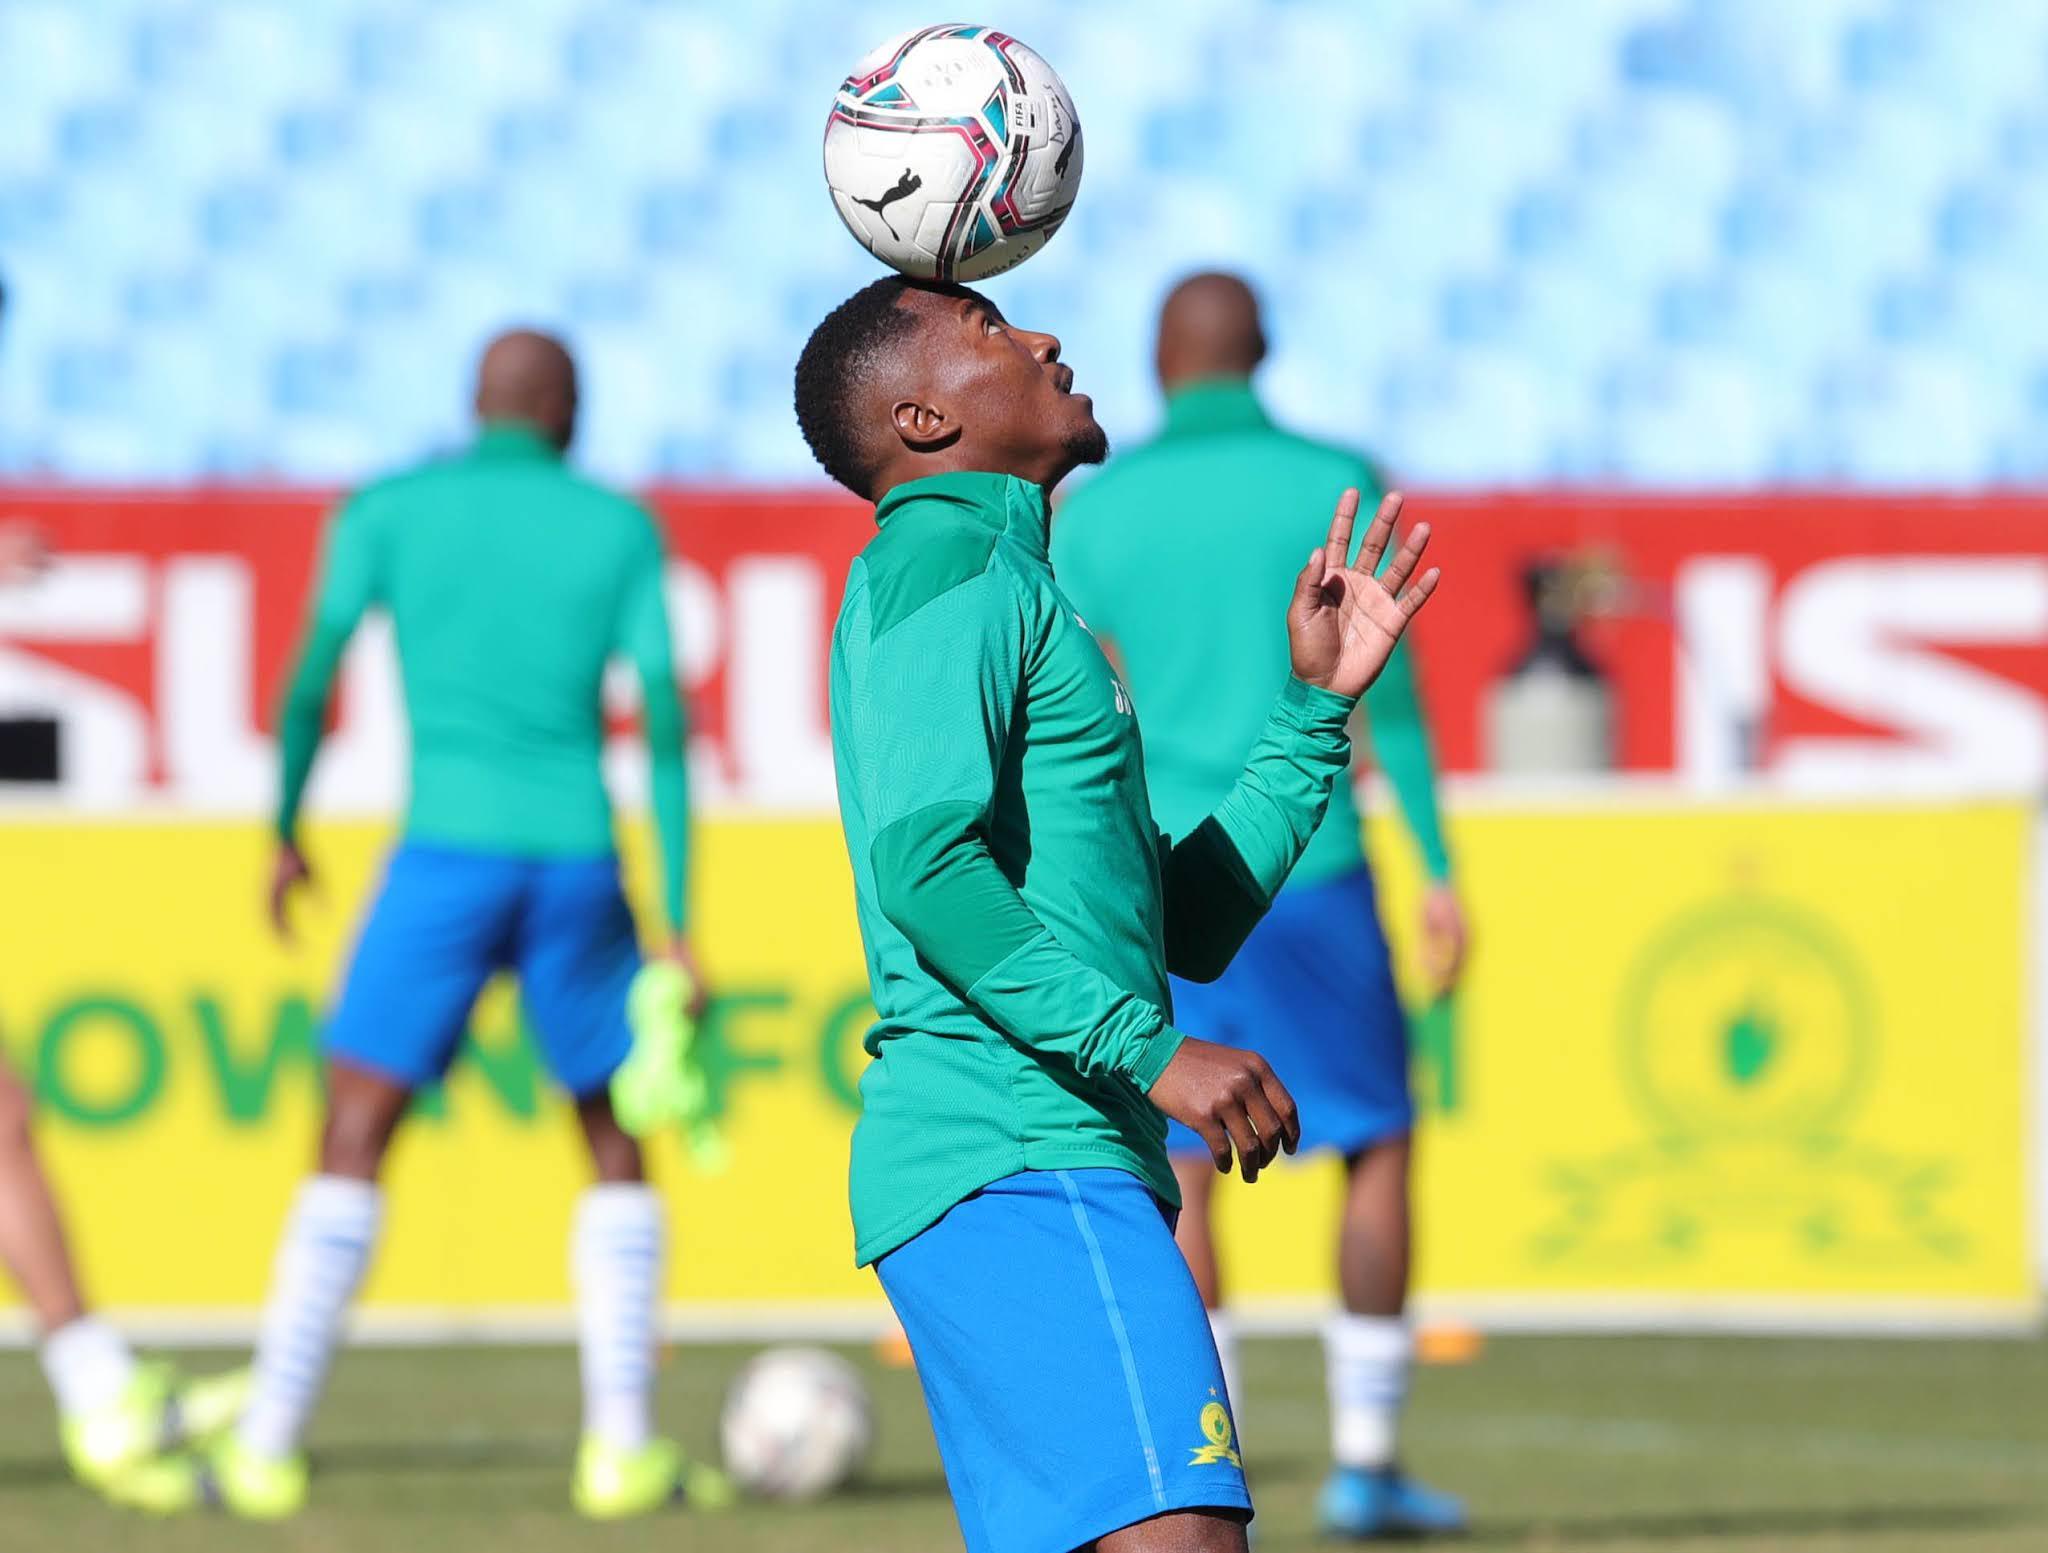 Mamelodi Sundowns attacker Lebohang Maboe